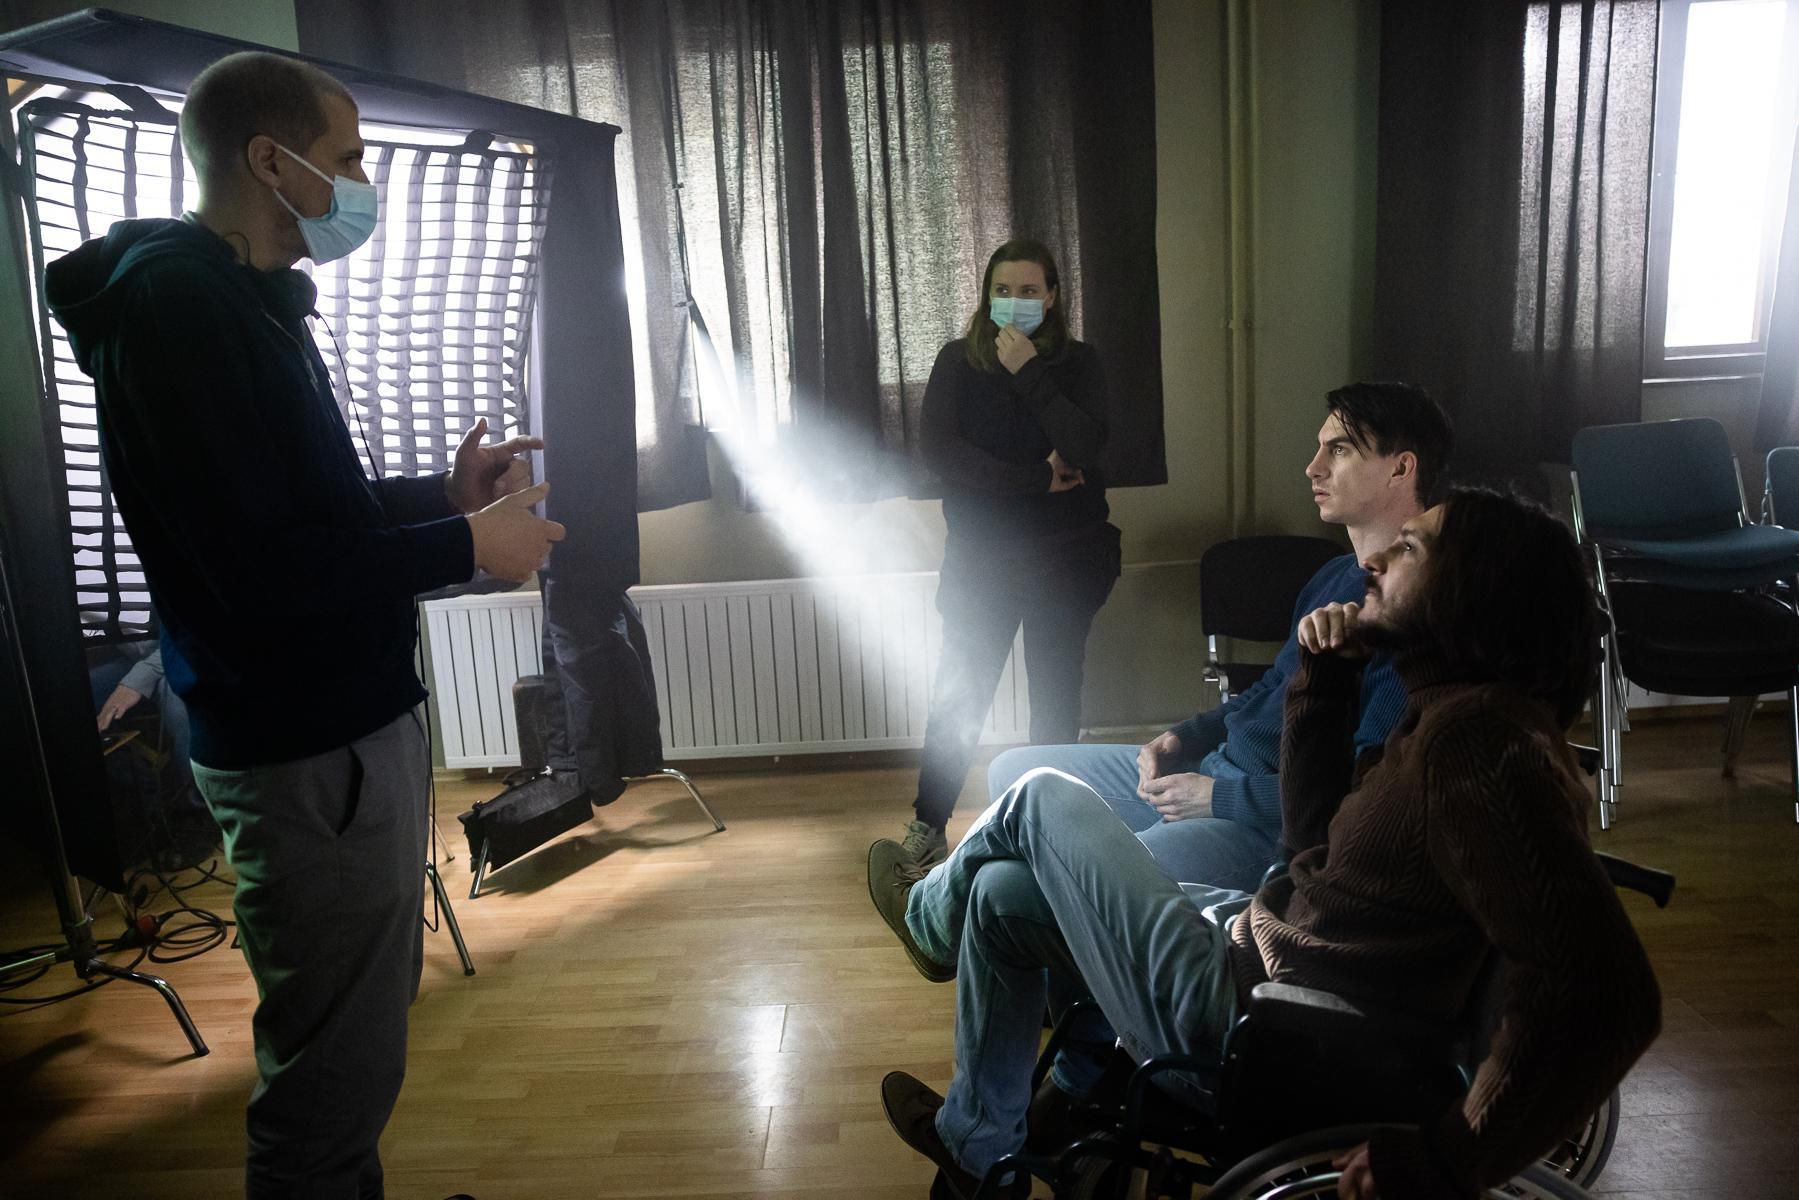 Director Marko Šantić, assistant director Irena Gatej and actors Blaž Setnikar and Jure Henigman on the set of Wake Me.